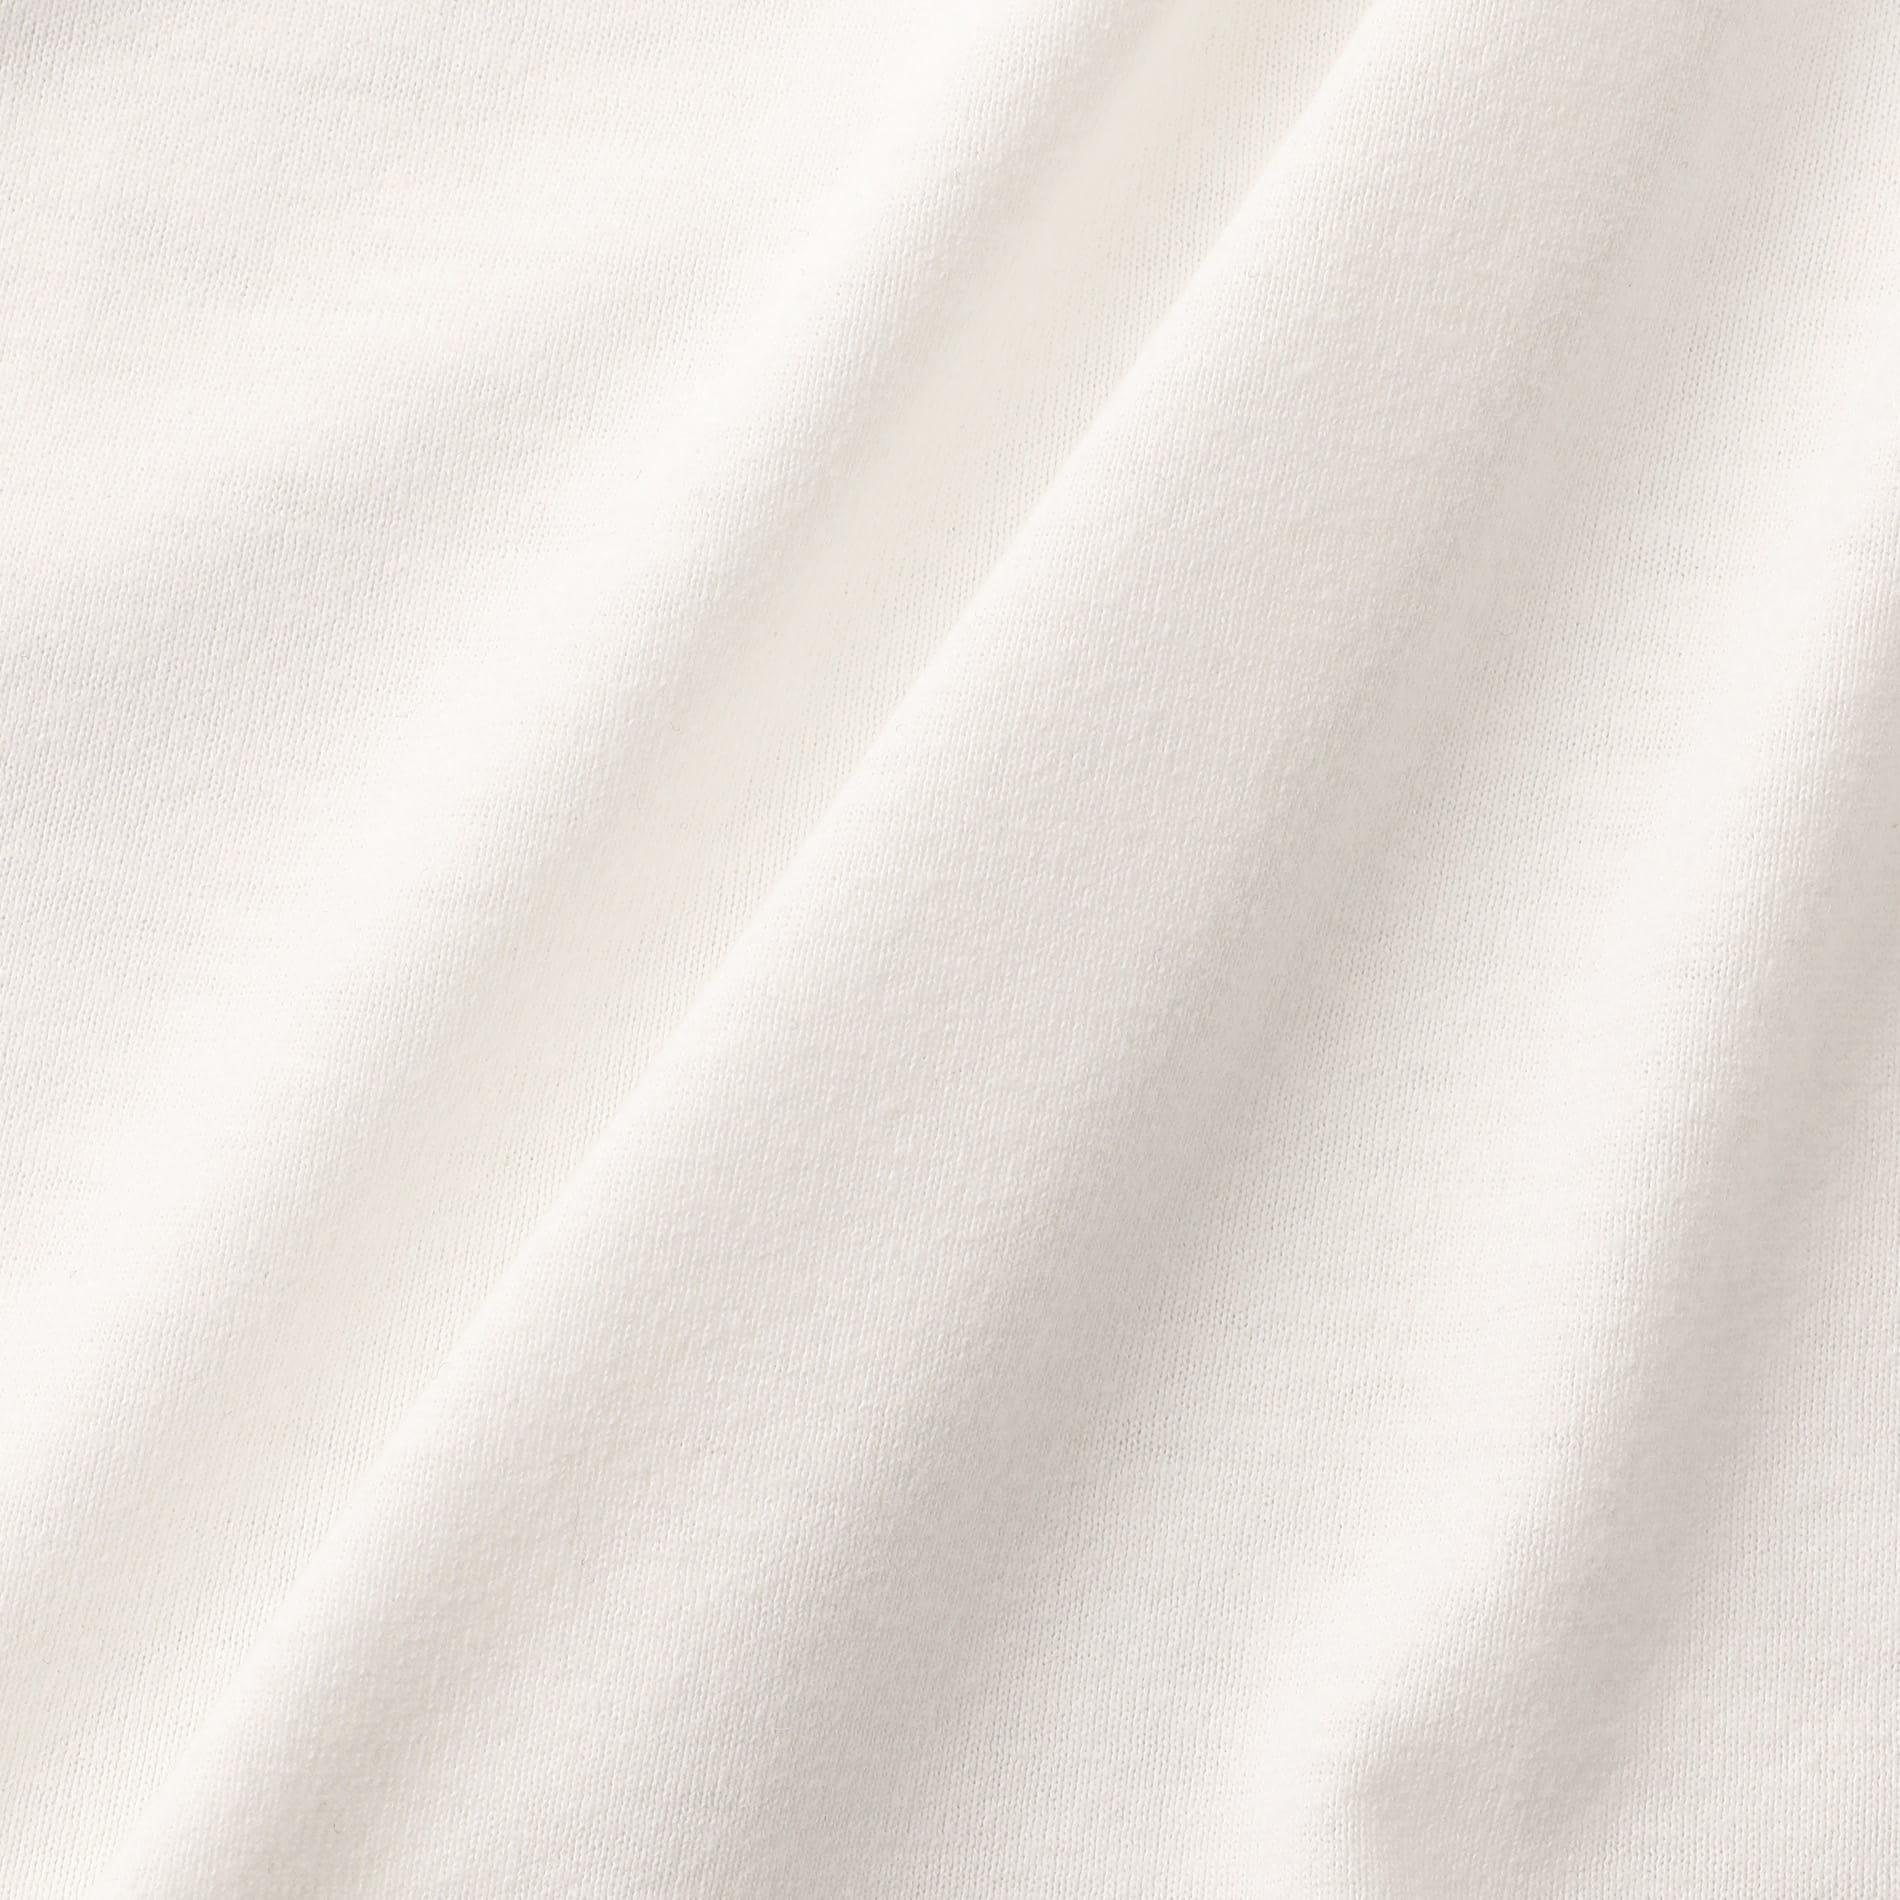 【Needles】WOMEN L/S MOCK NECK TEE POLY JERSEY HM247